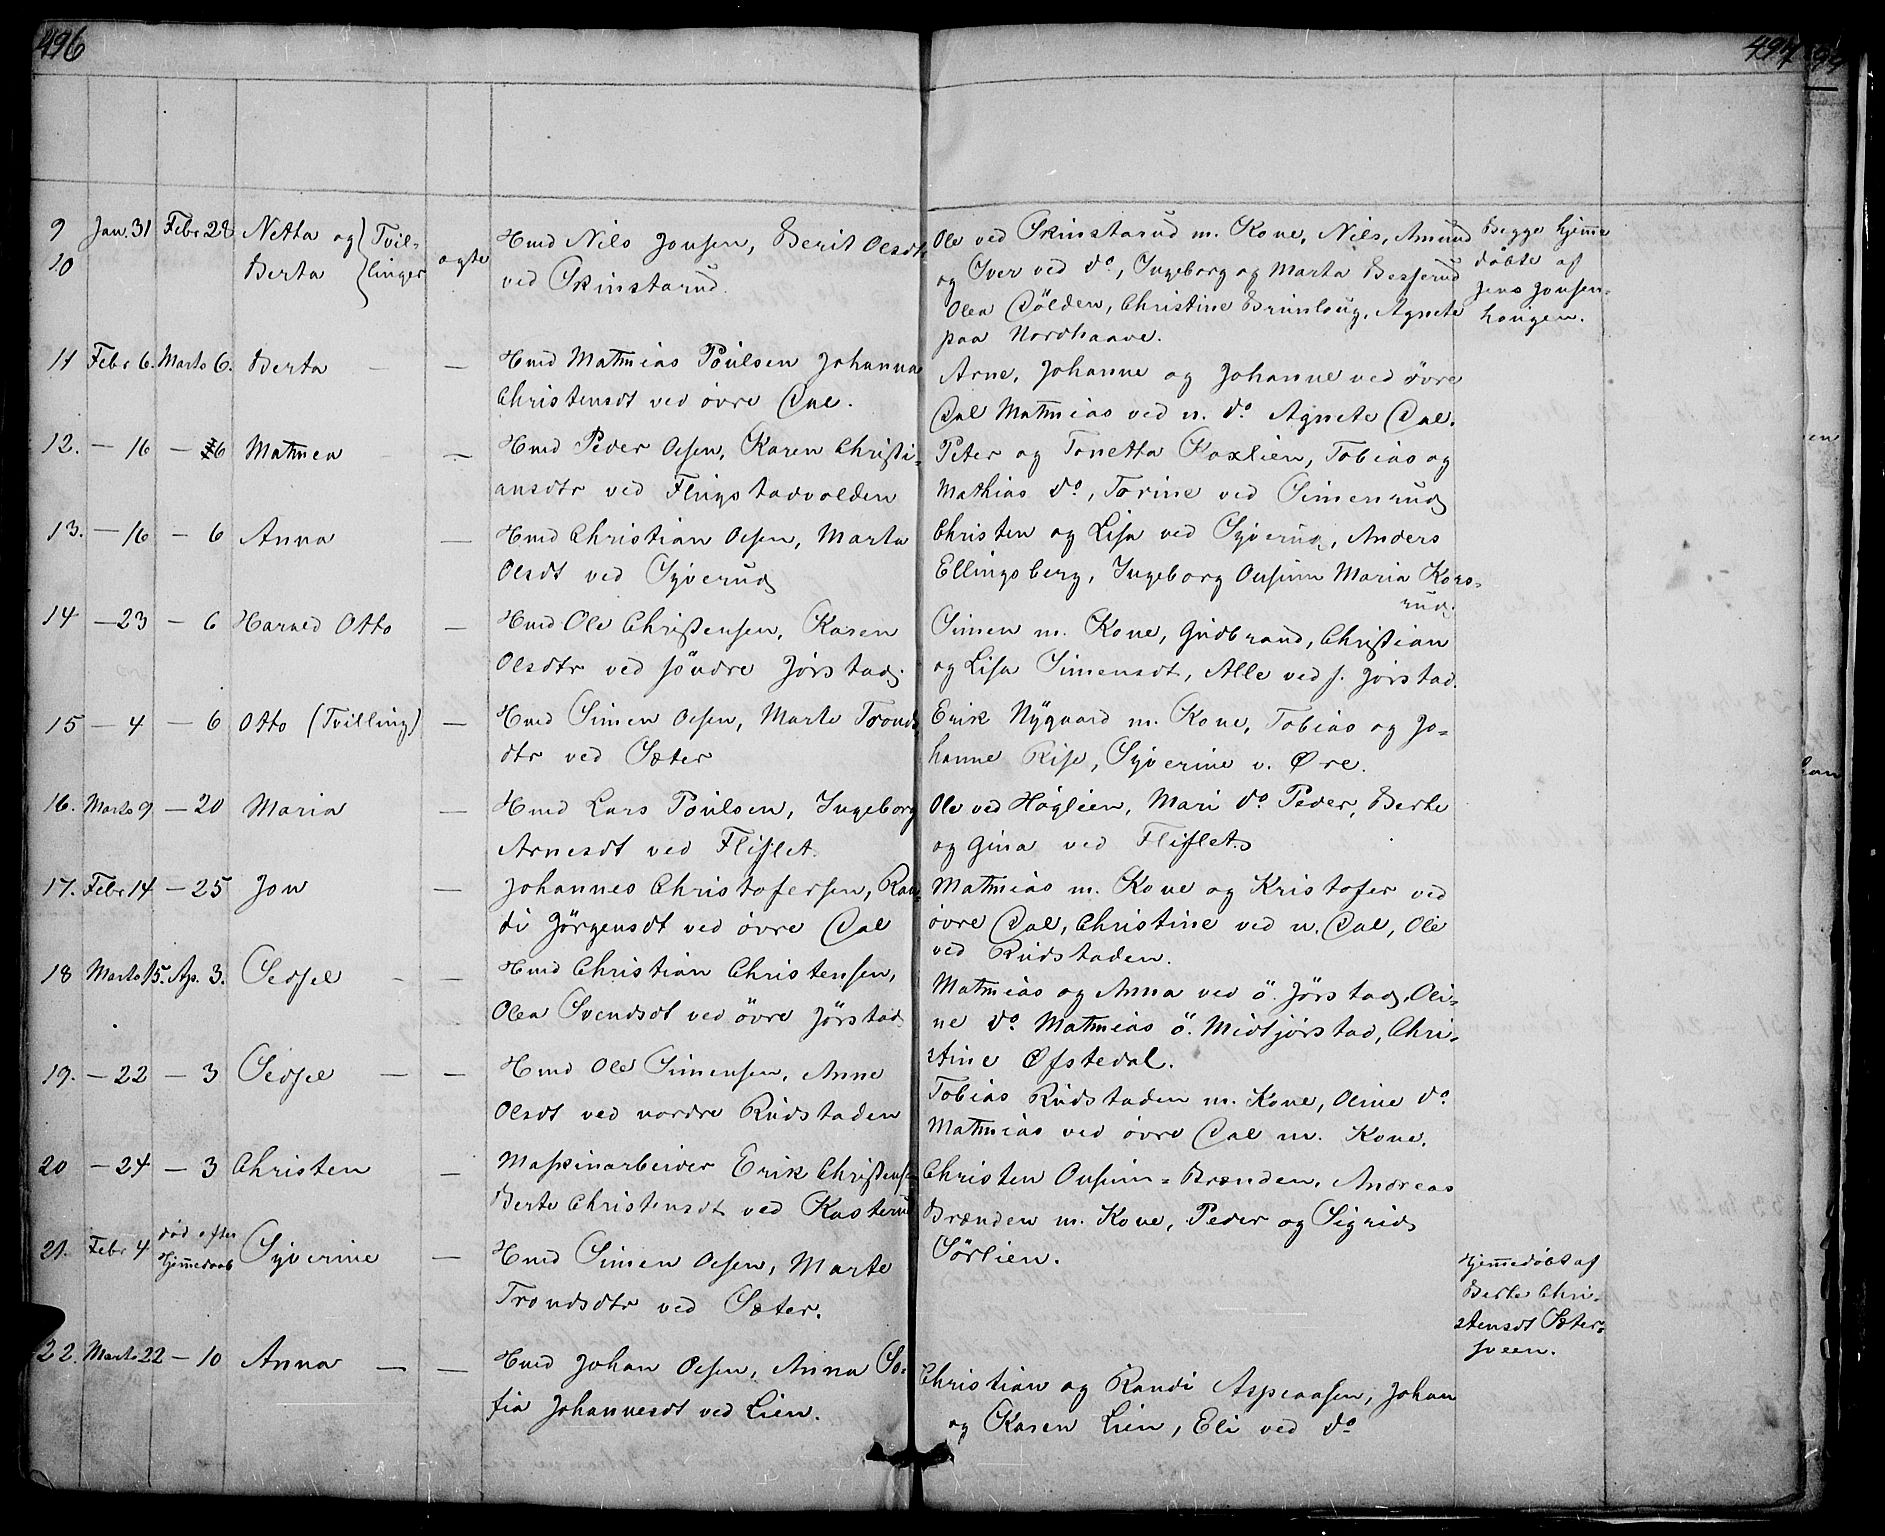 SAH, Fåberg prestekontor, H/Ha/Hab/L0005: Parish register (copy) no. 5, 1837-1864, p. 496-497